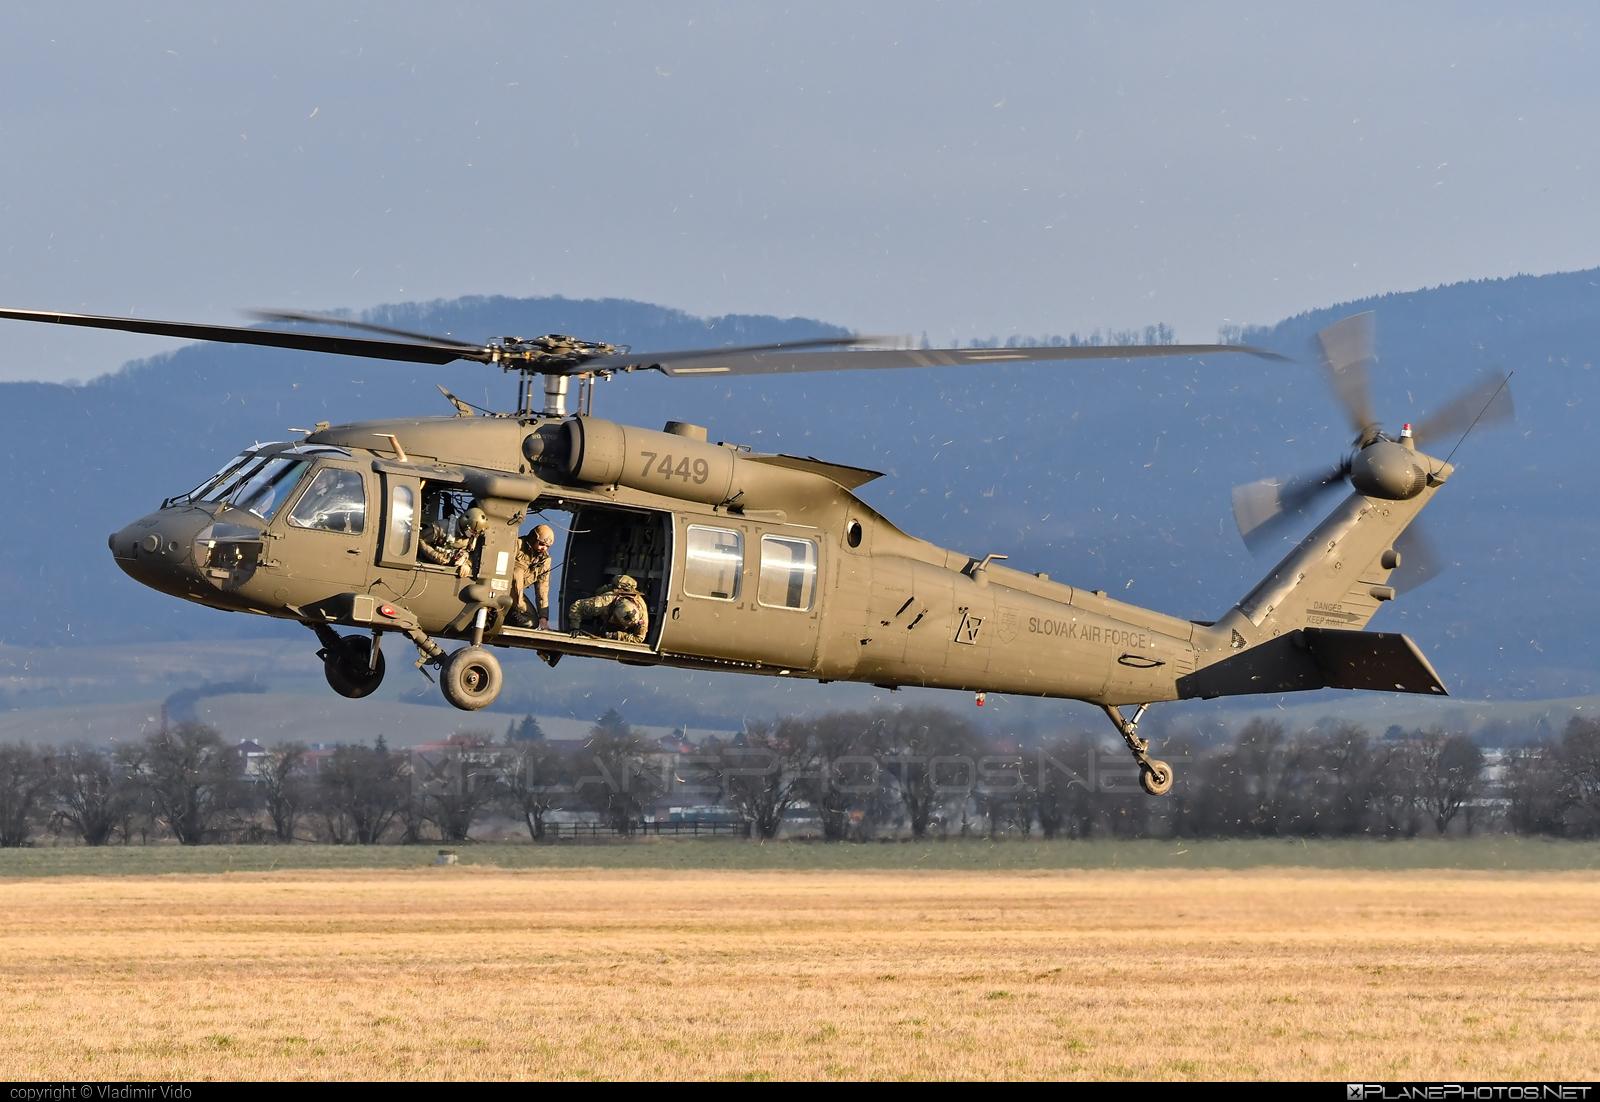 Sikorsky UH-60M Black Hawk - 7449 operated by Vzdušné sily OS SR (Slovak Air Force) #blackhawk #sikorsky #slovakairforce #uh60 #uh60blackhawk #uh60m #vzdusnesilyossr